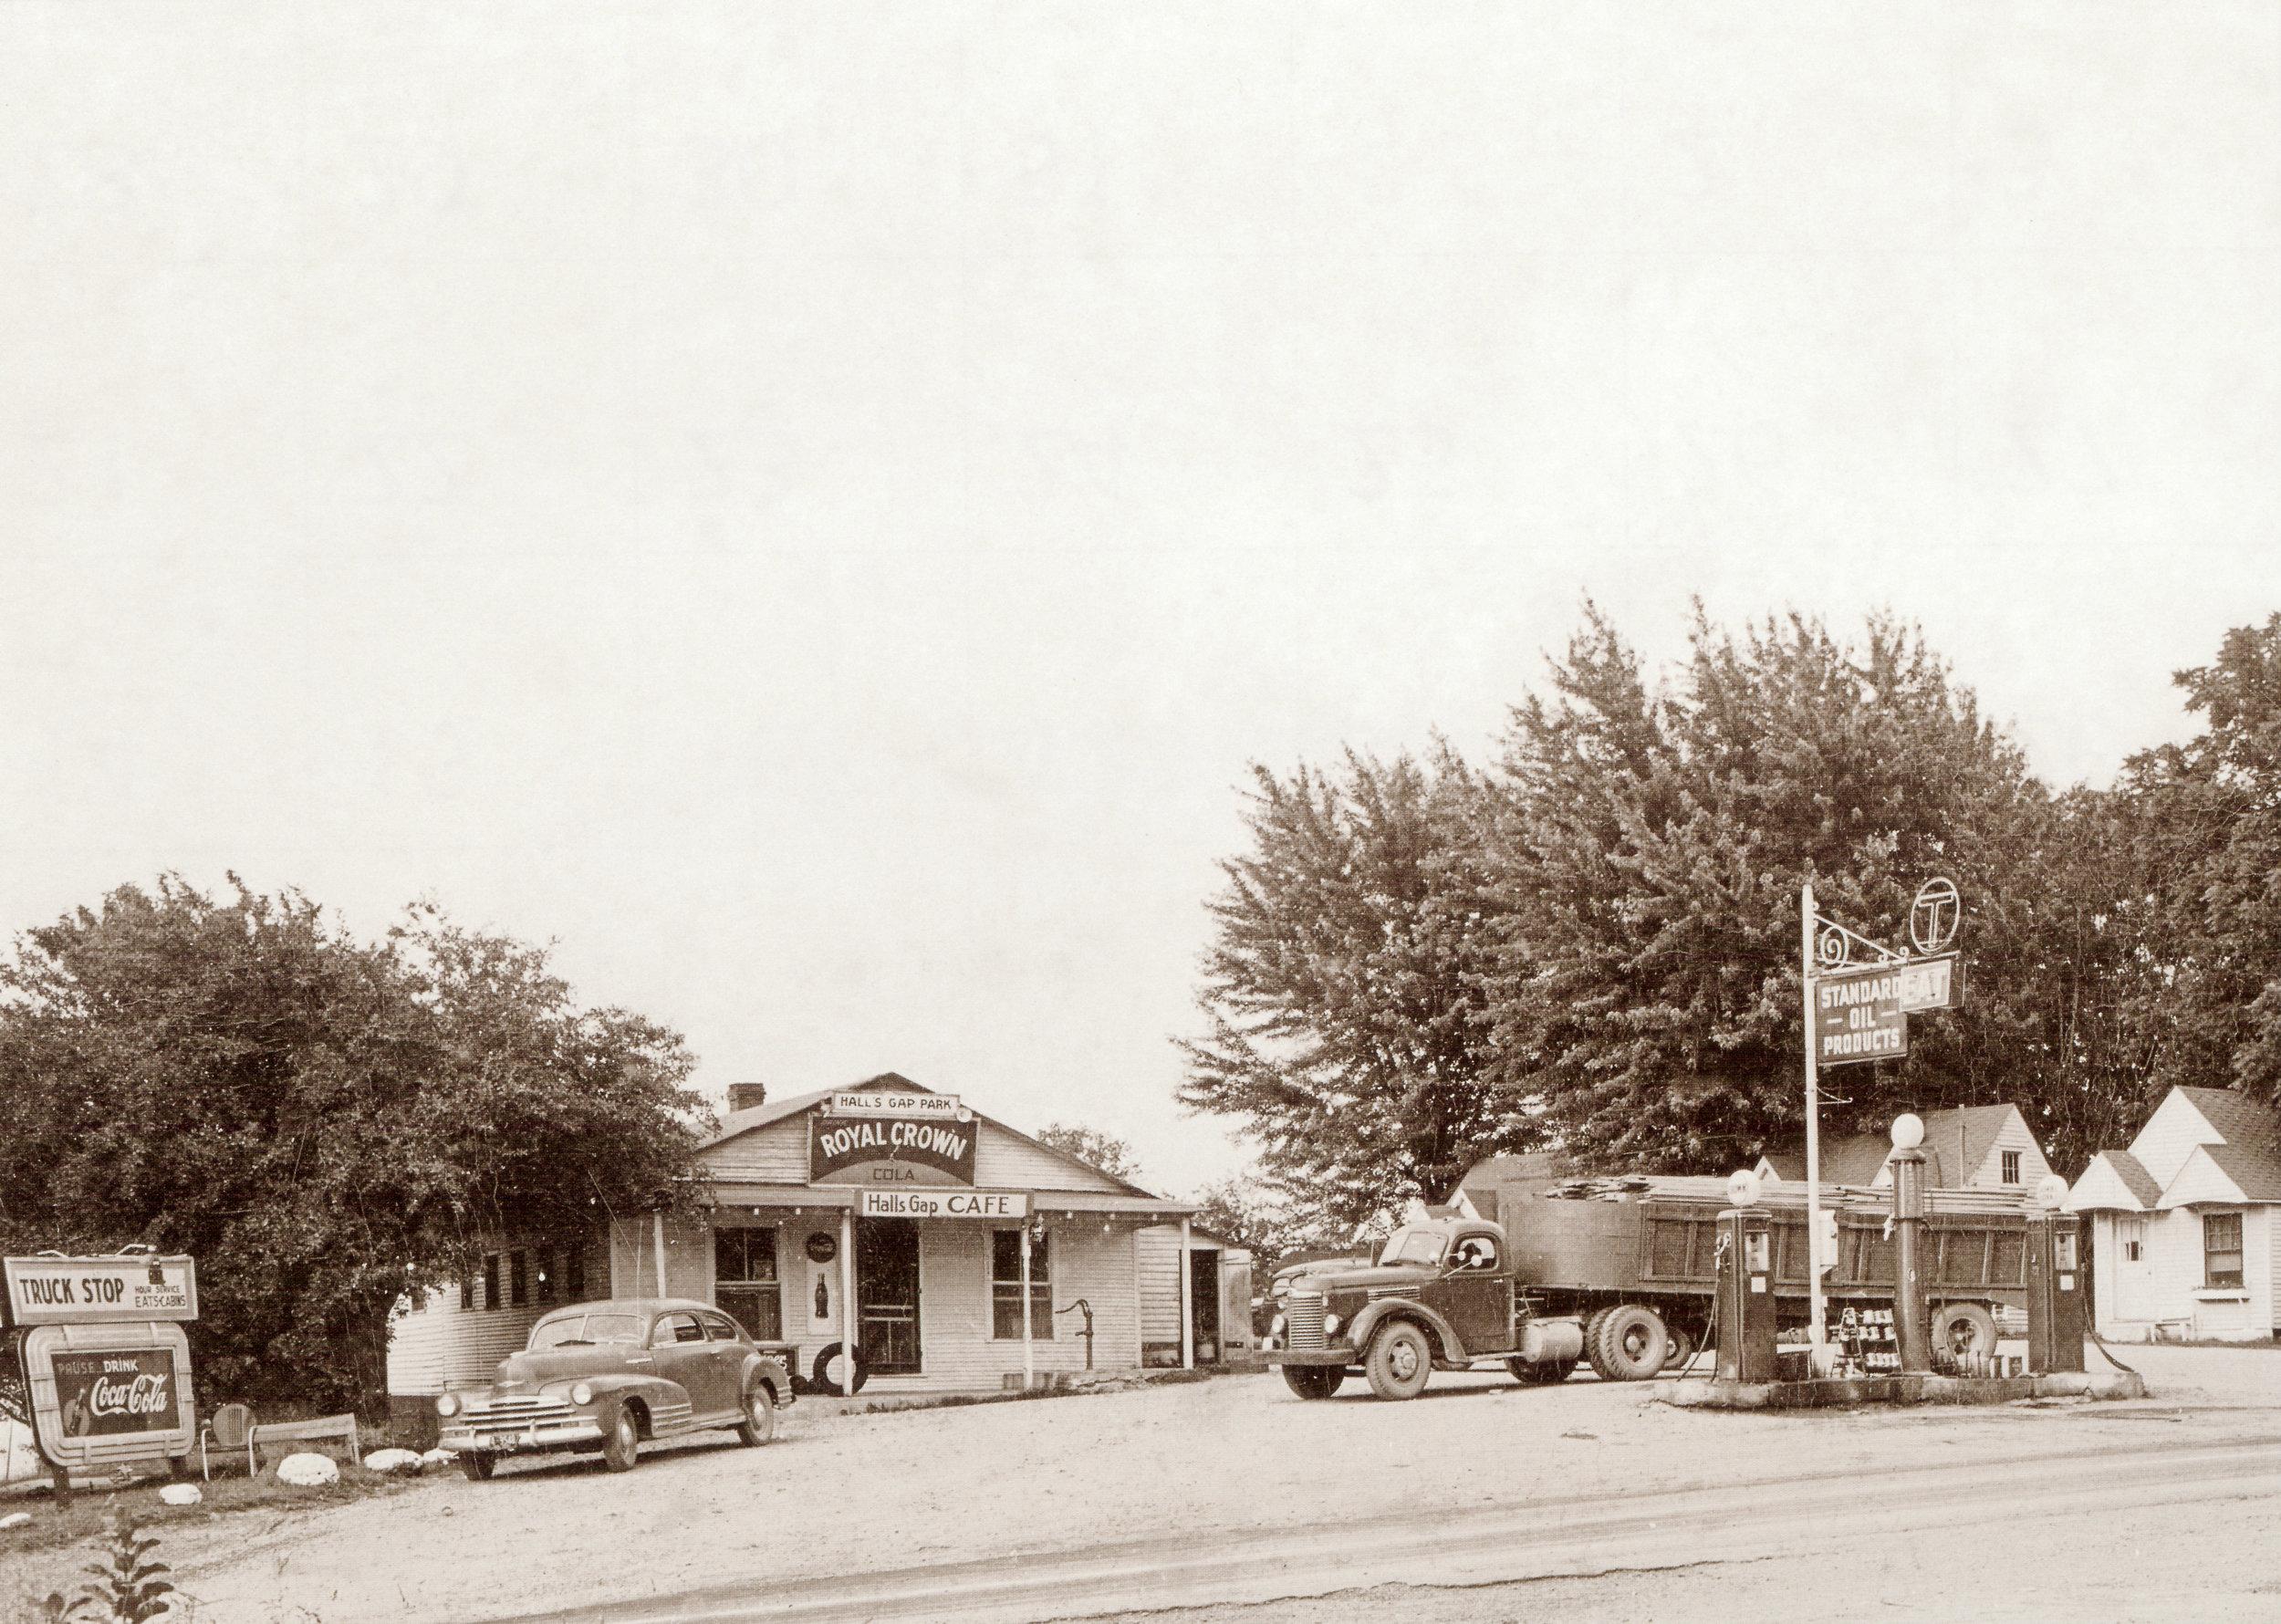 Hall's Gap, Kentucky, along U.S. 27